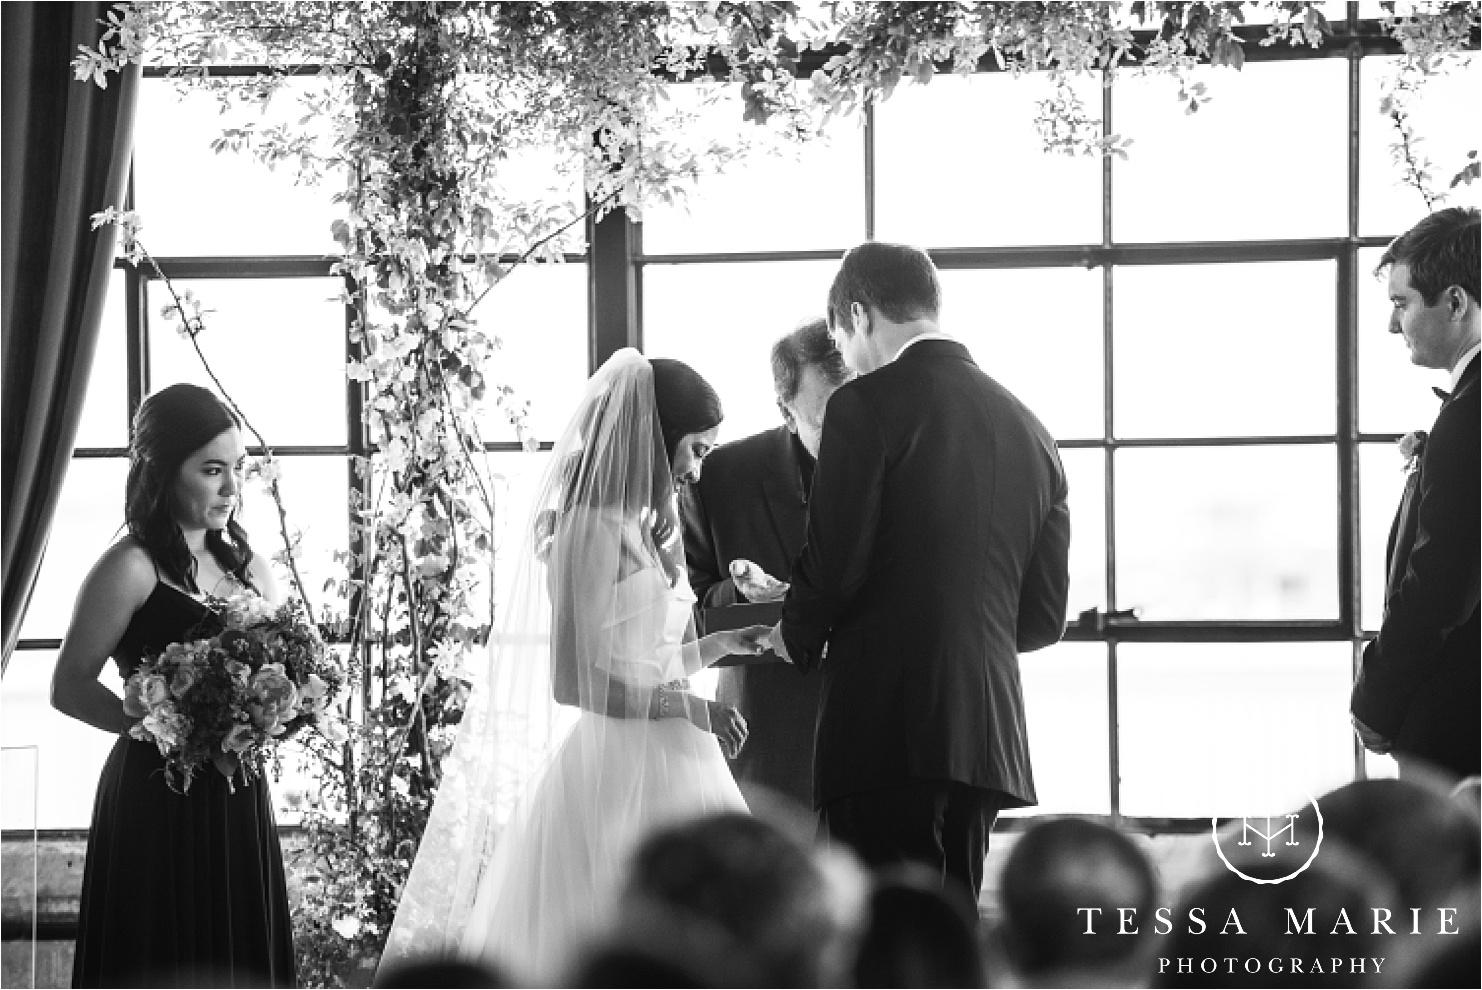 Tessa_marie_weddings_houston_wedding_photographer_The_astorian_0119.jpg